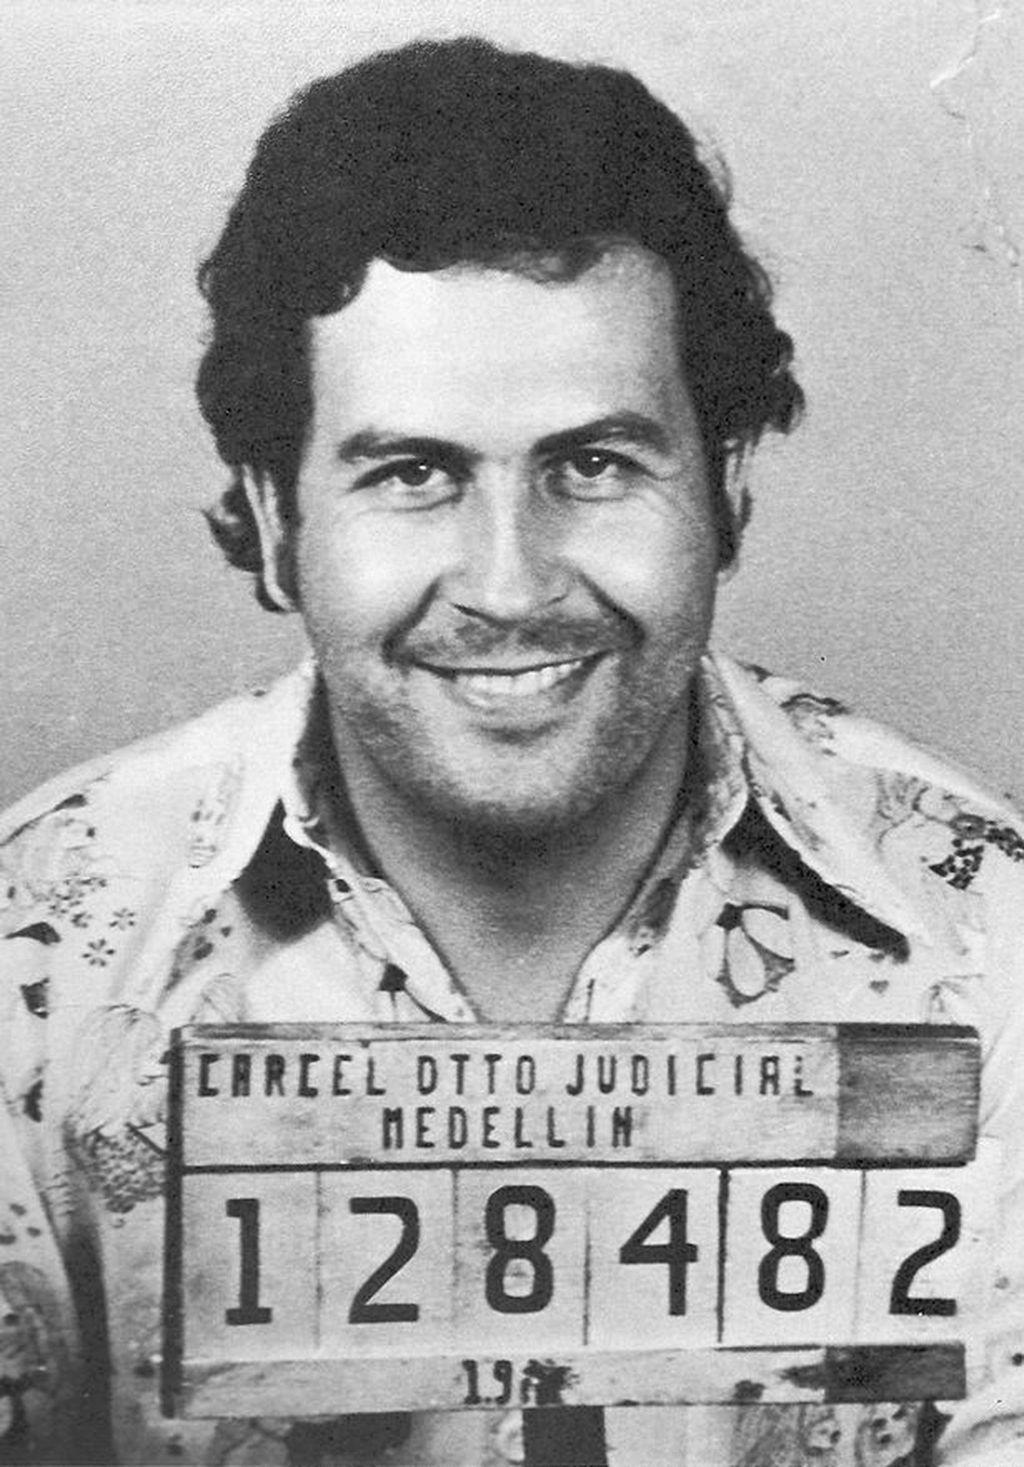 Pablo Escobar - mug shot taken by the regional Colombia control agency in Medellin in 1976